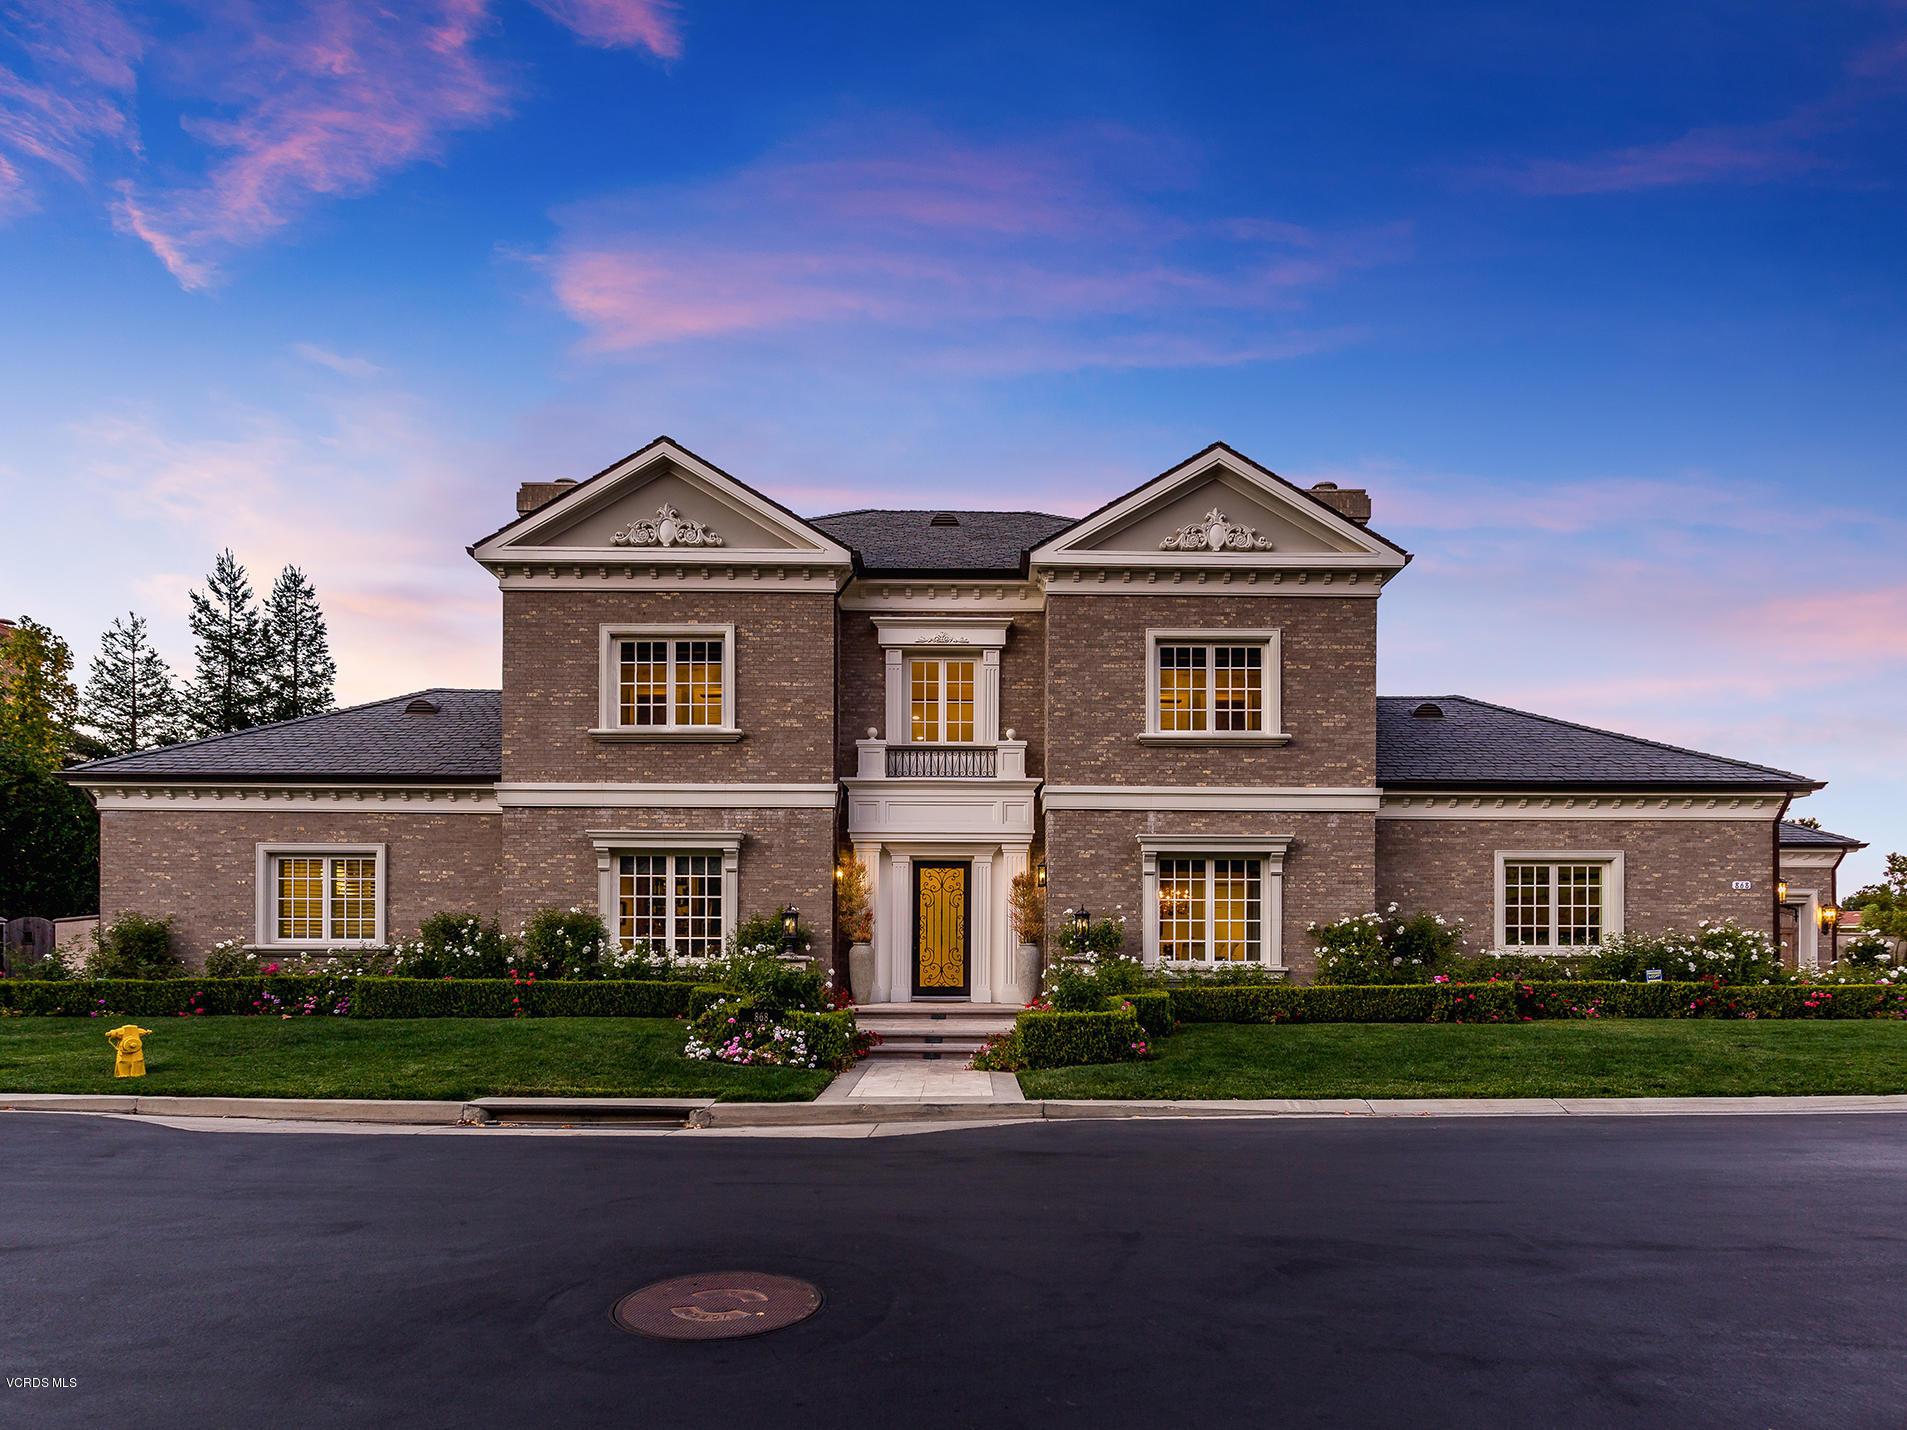 Photo of 868 W Stafford Road, Thousand Oaks, CA 91361